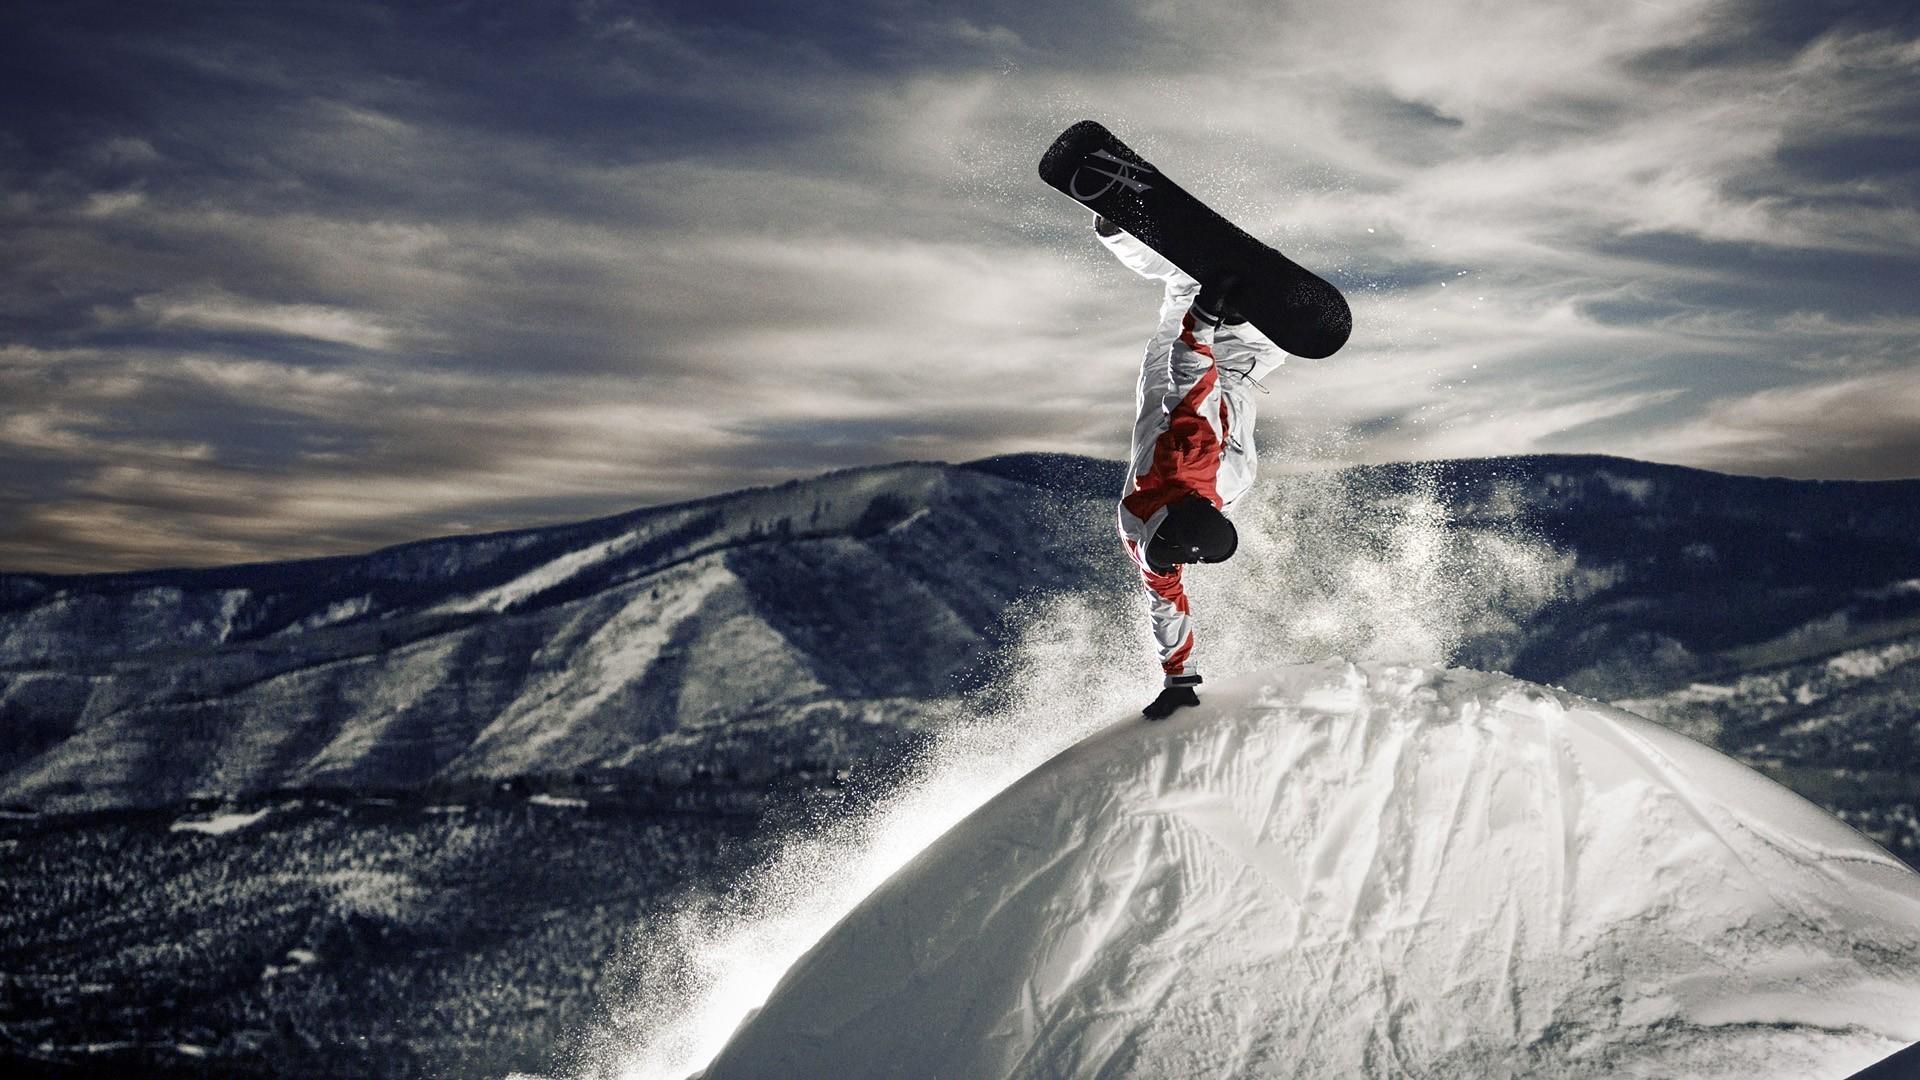 183974.jpg (JPEG-Grafik, 1920 × 1080 Pixel) – Skaliert (66%) | Sport |  Pinterest | Snowboarding and Snow board